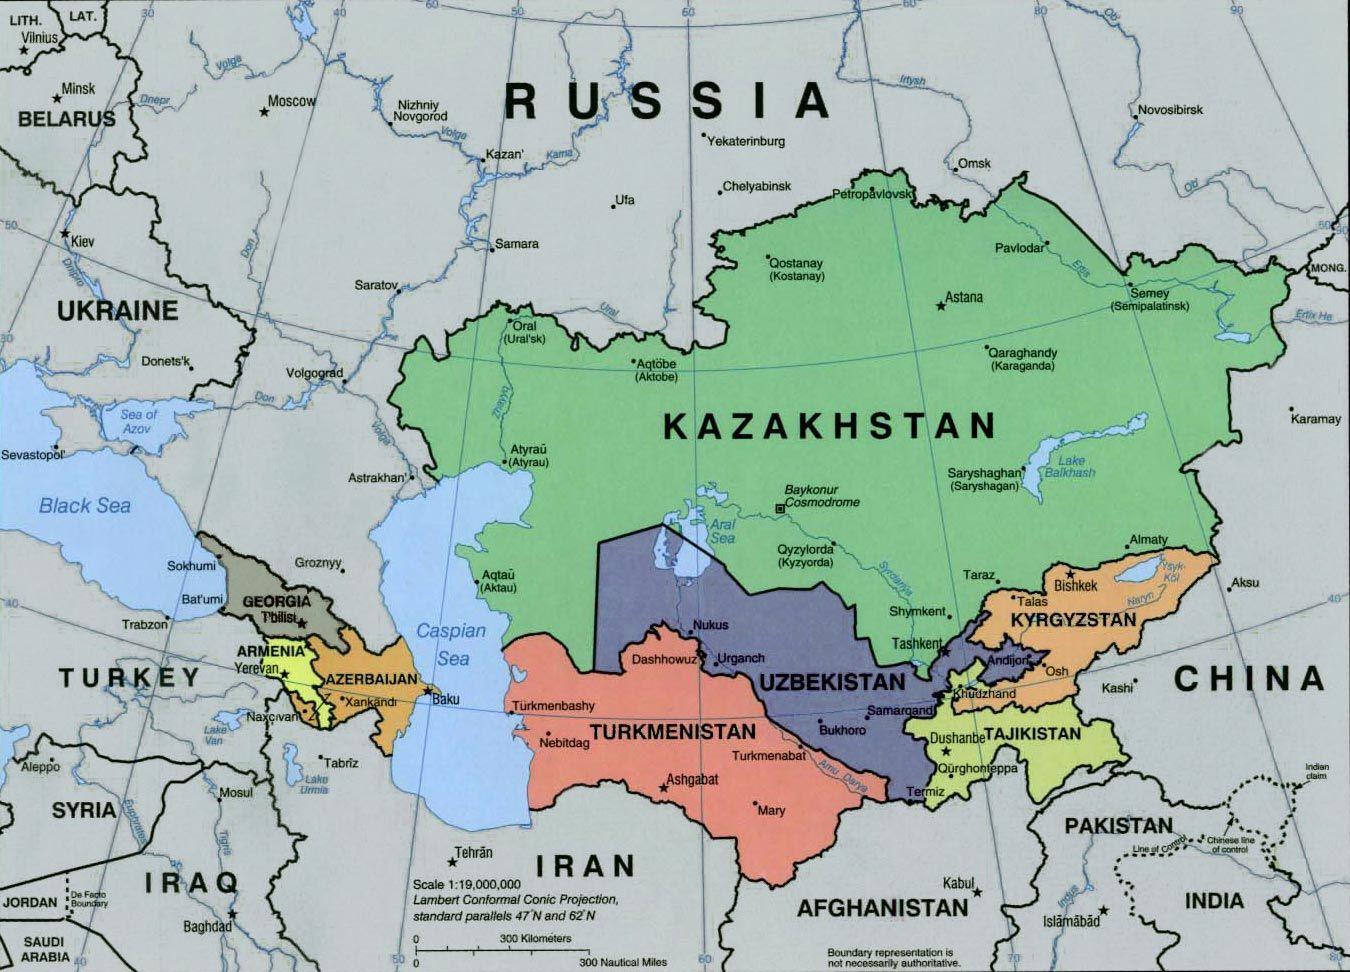 Caspian sea countries map google search a bit of everything caspian sea countries map google search gumiabroncs Gallery